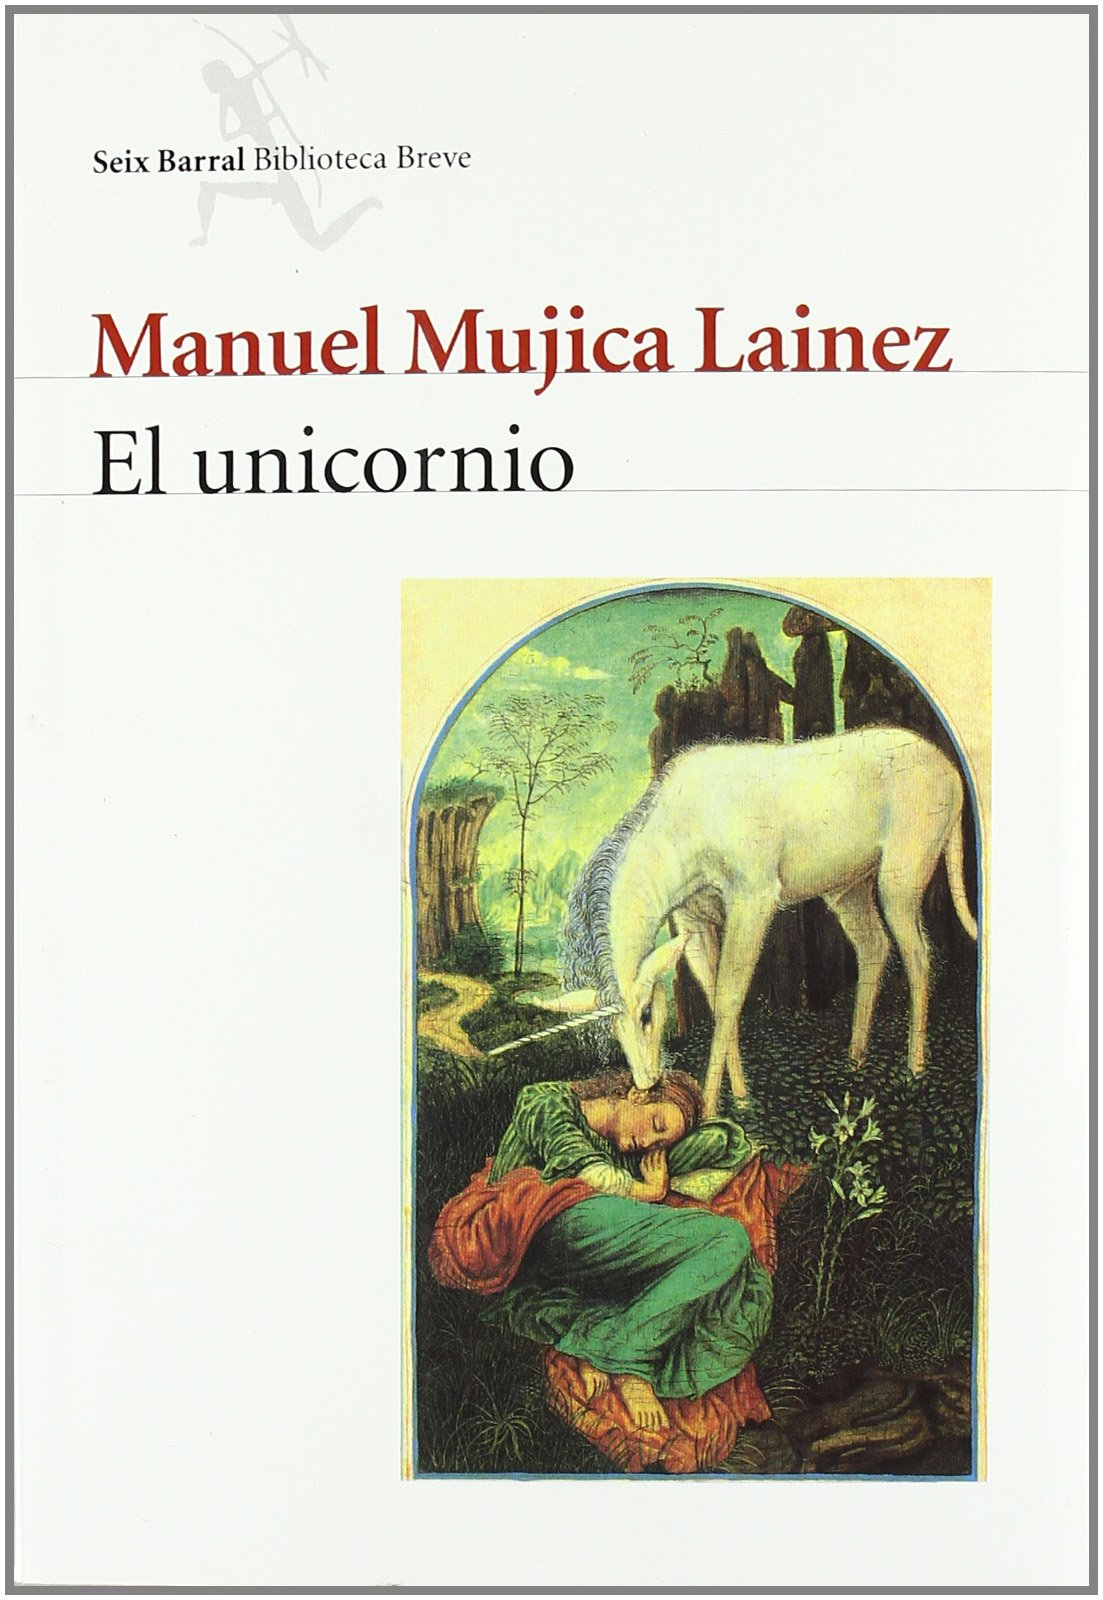 El unicornio: Manuel Mujica Láinez: 9788432210839: Amazon ...